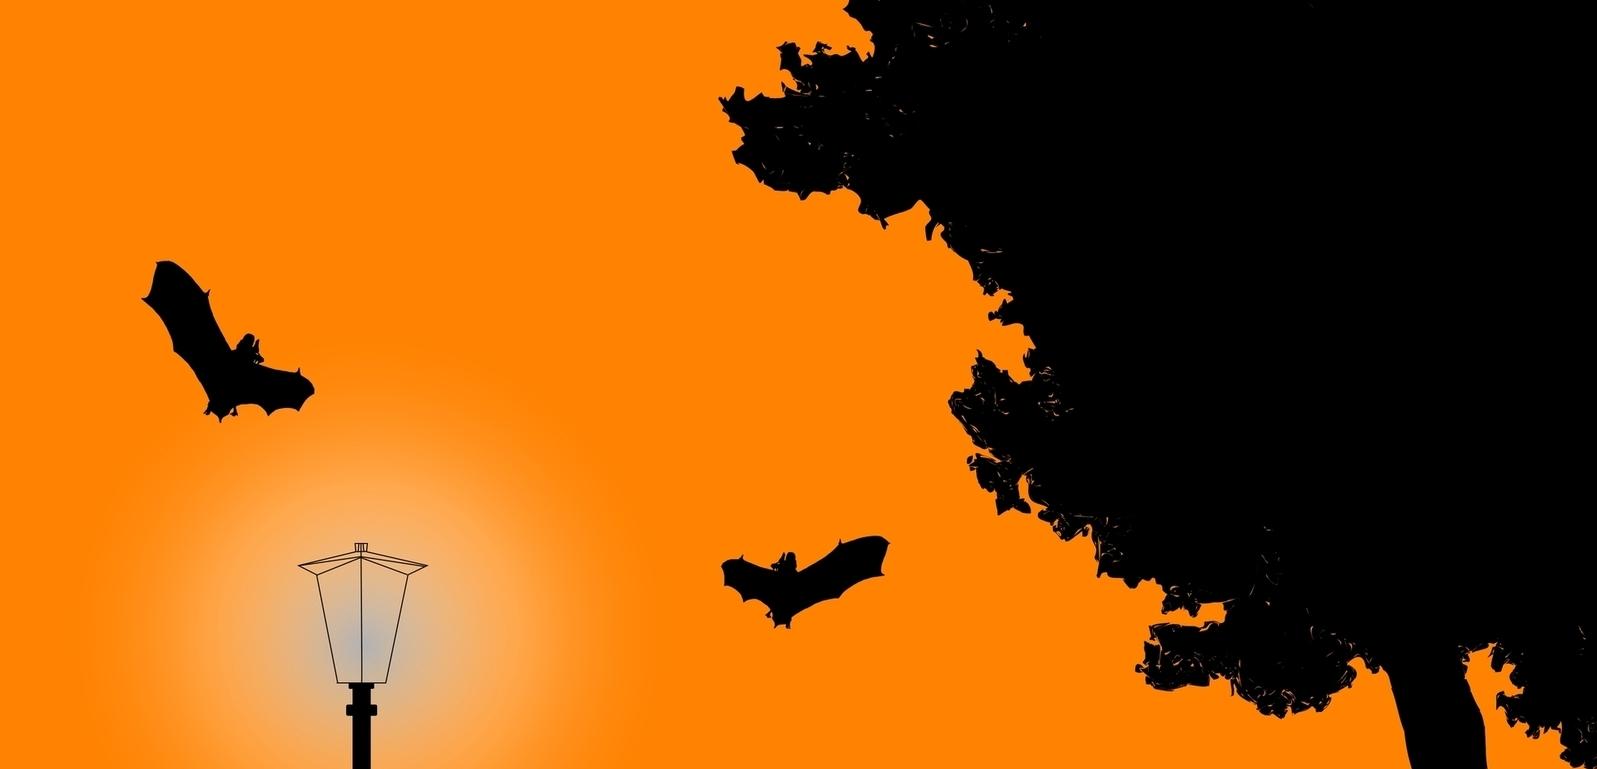 Bats, viruses, immunity and Covid-19